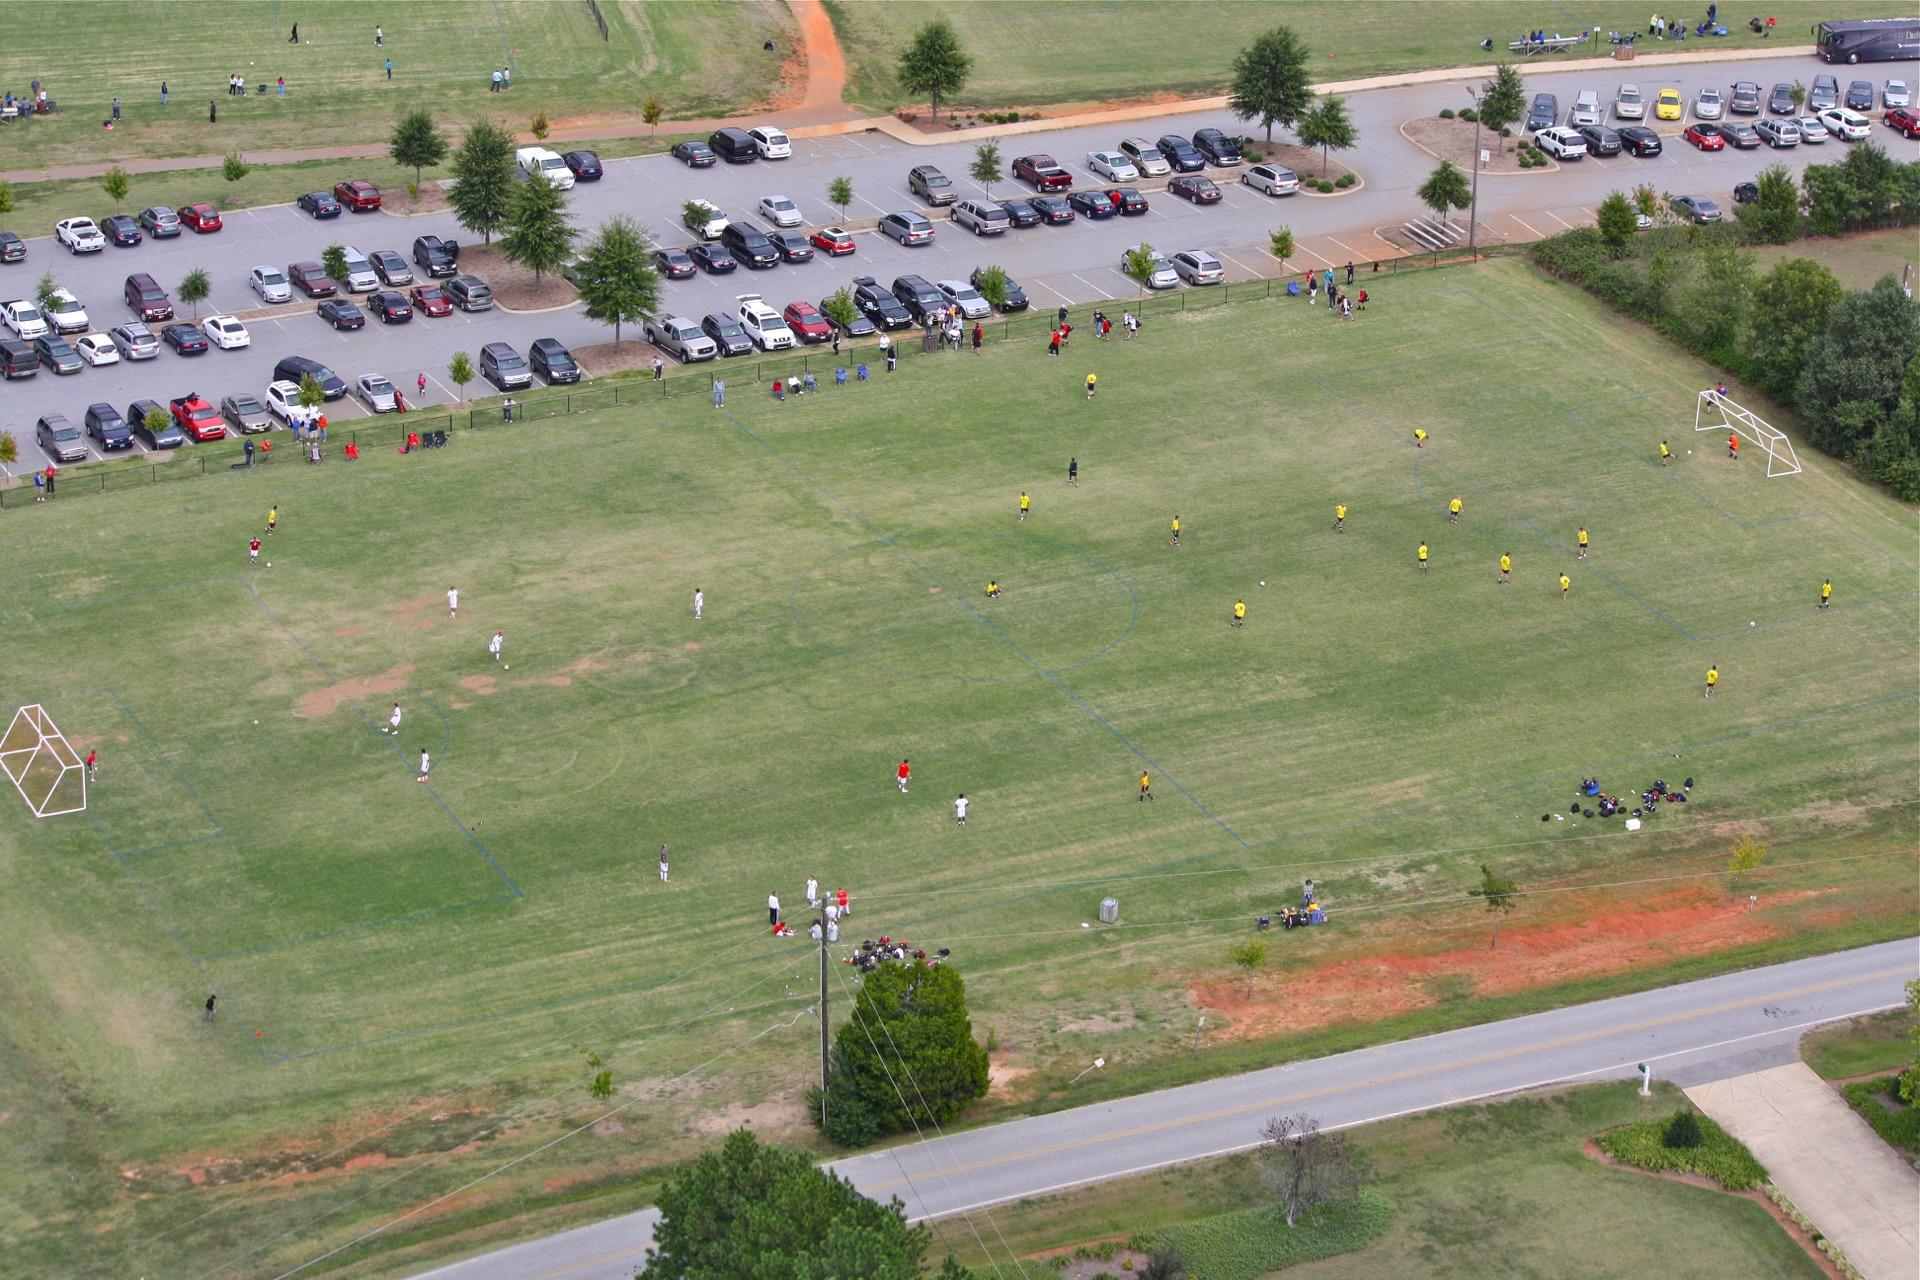 gary L. pittman park aerial view soccer field